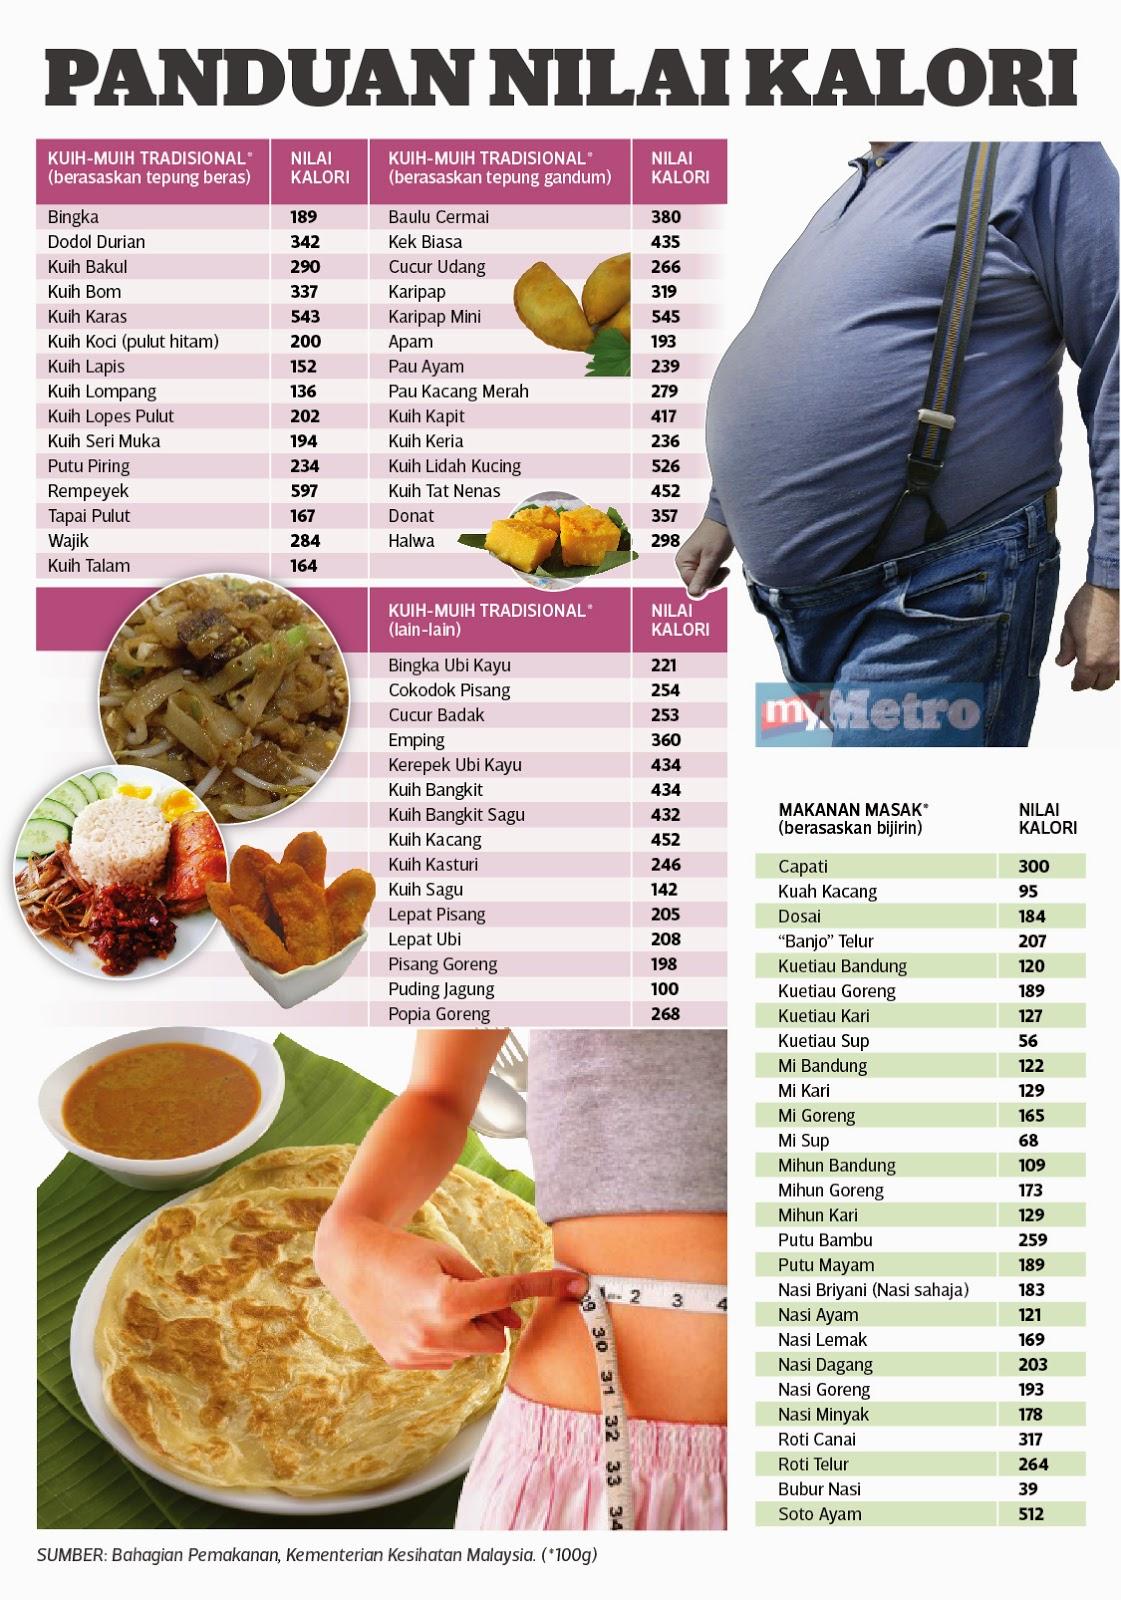 Panduan Nilai Kalori makanan